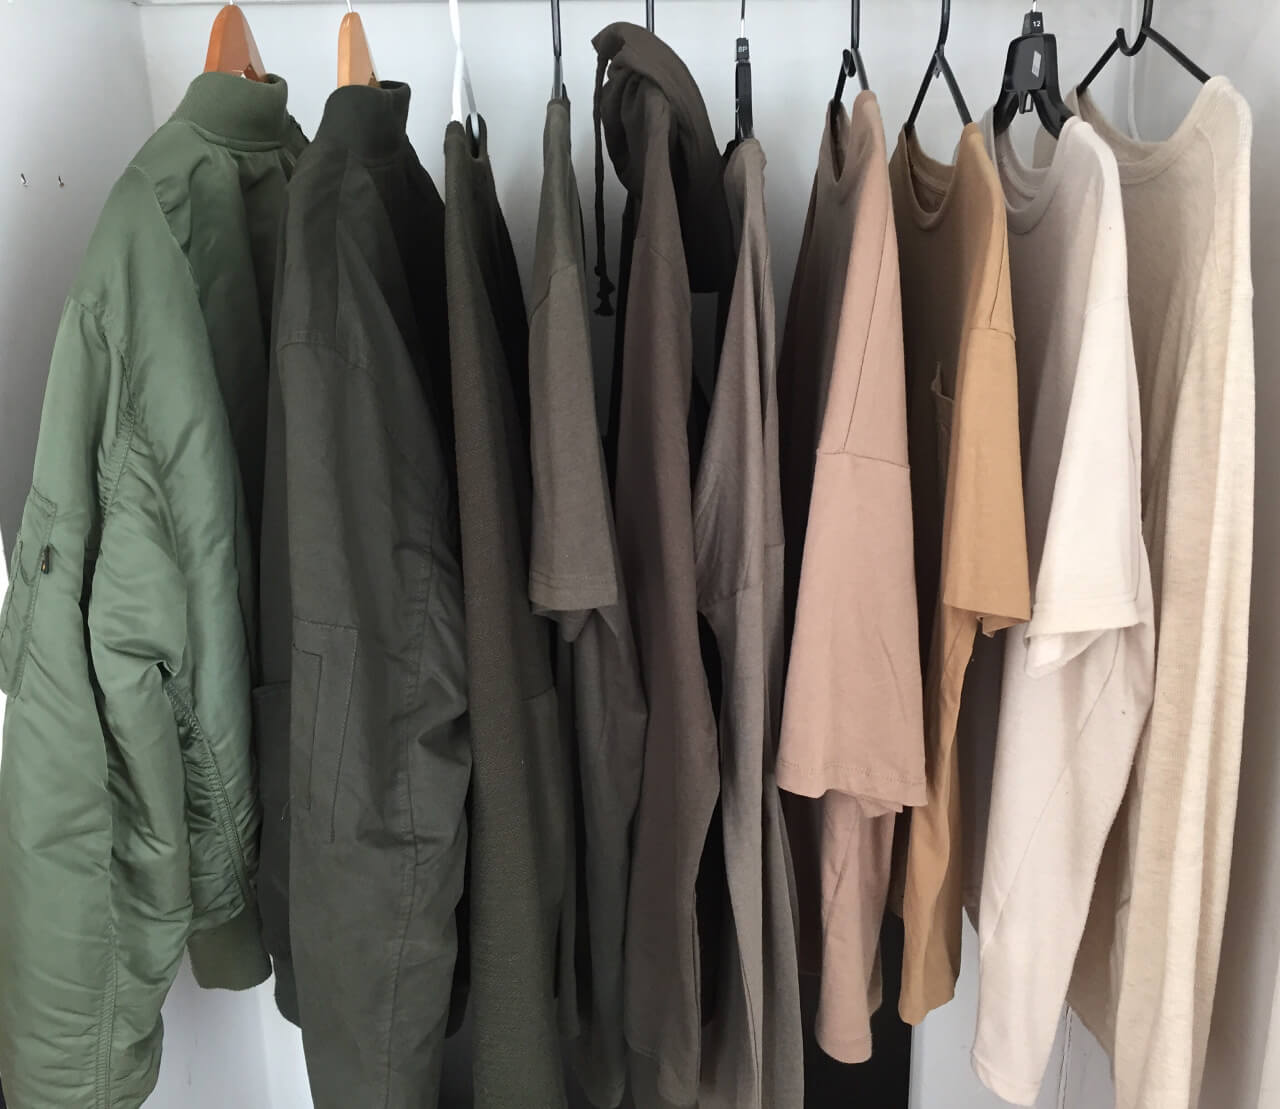 Best Clothing Brands With Minimalist Designs Men